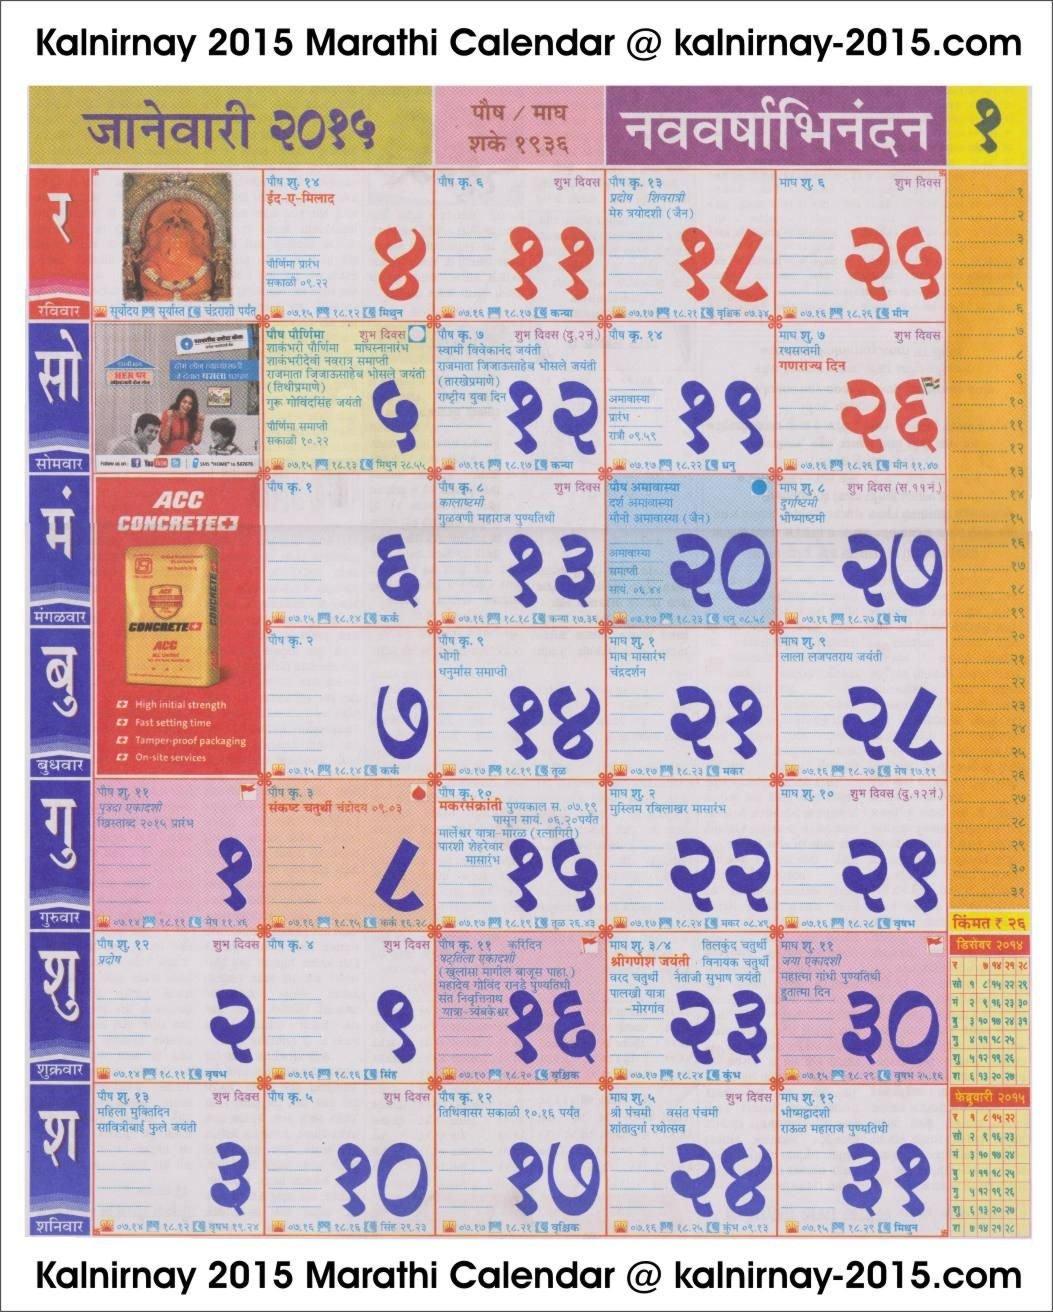 January 2015 Marathi Kalnirnay Calendar | 2015 Kalnirnay Marathi Calendar 2019 Kalnirnay